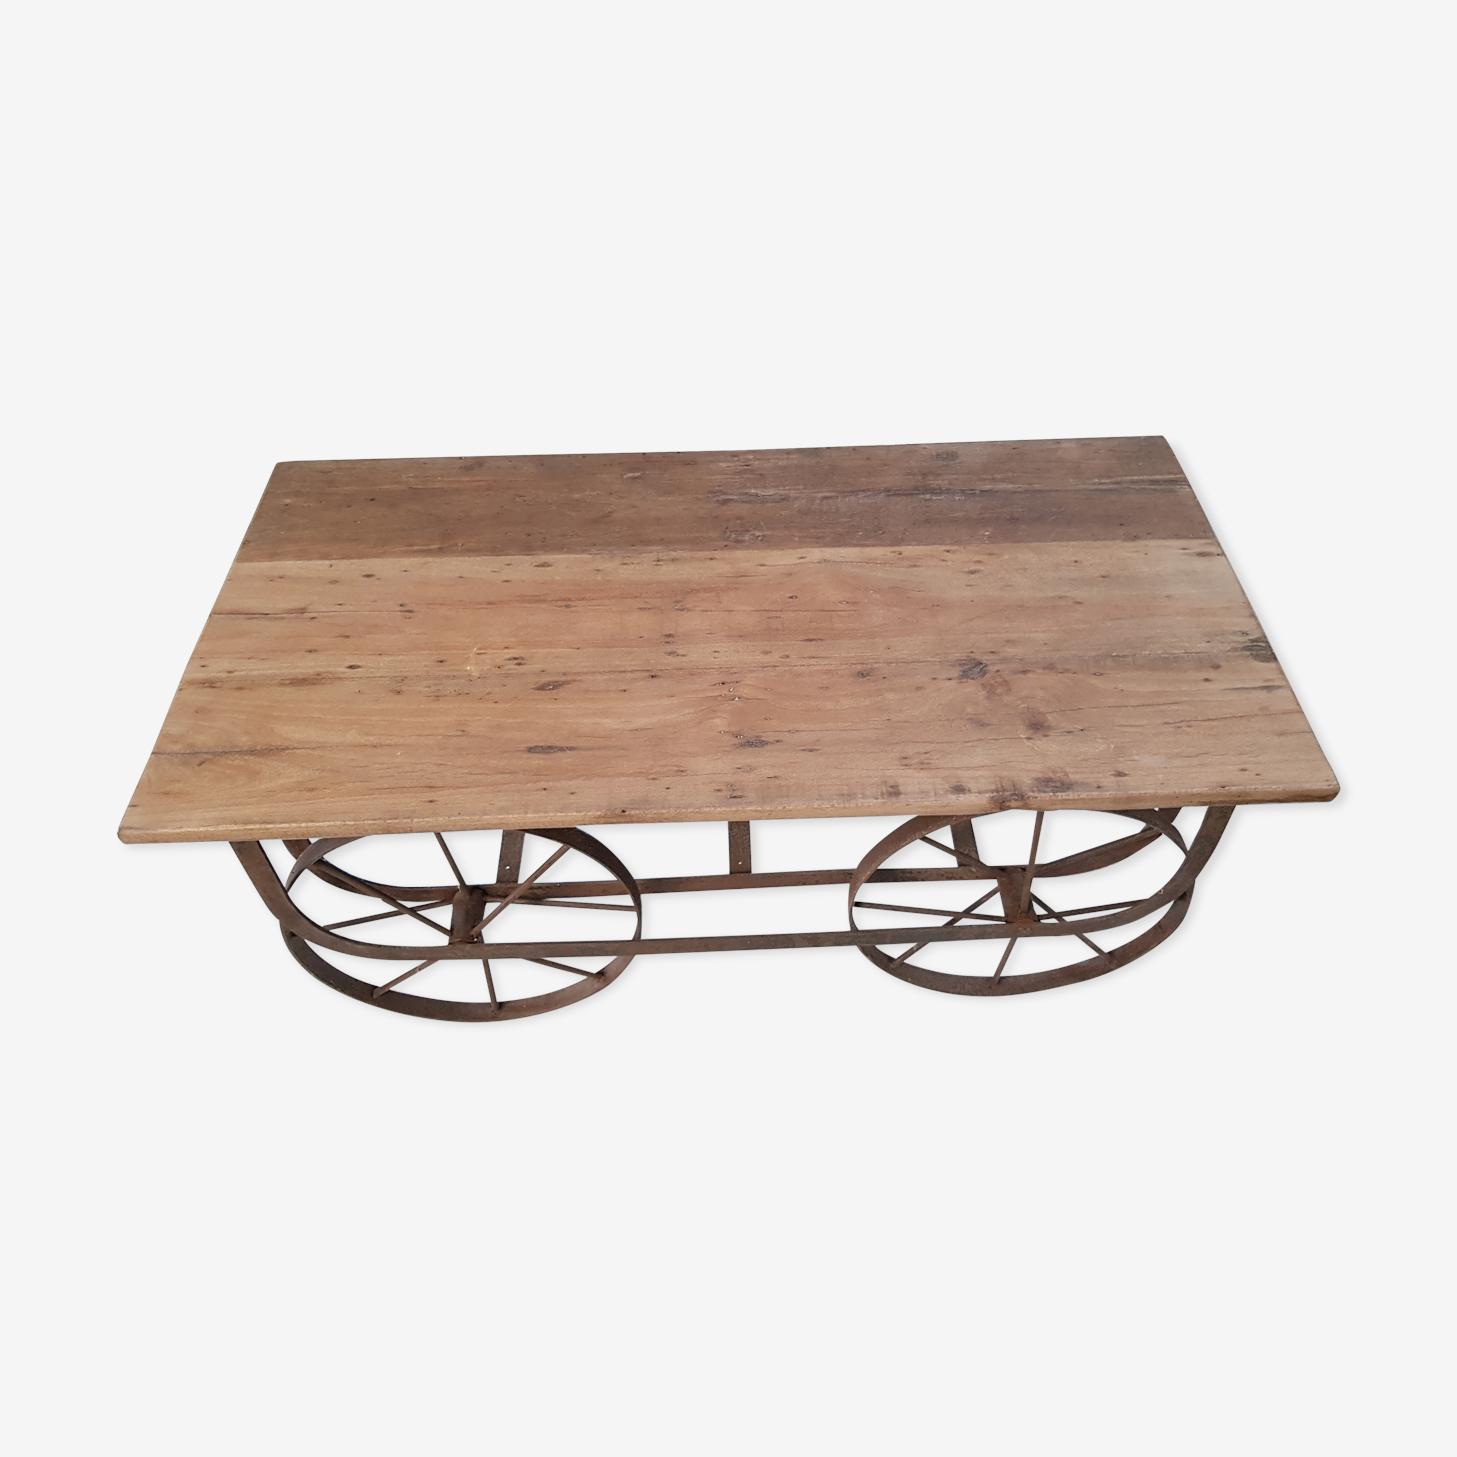 Indian merchant shop coffee table